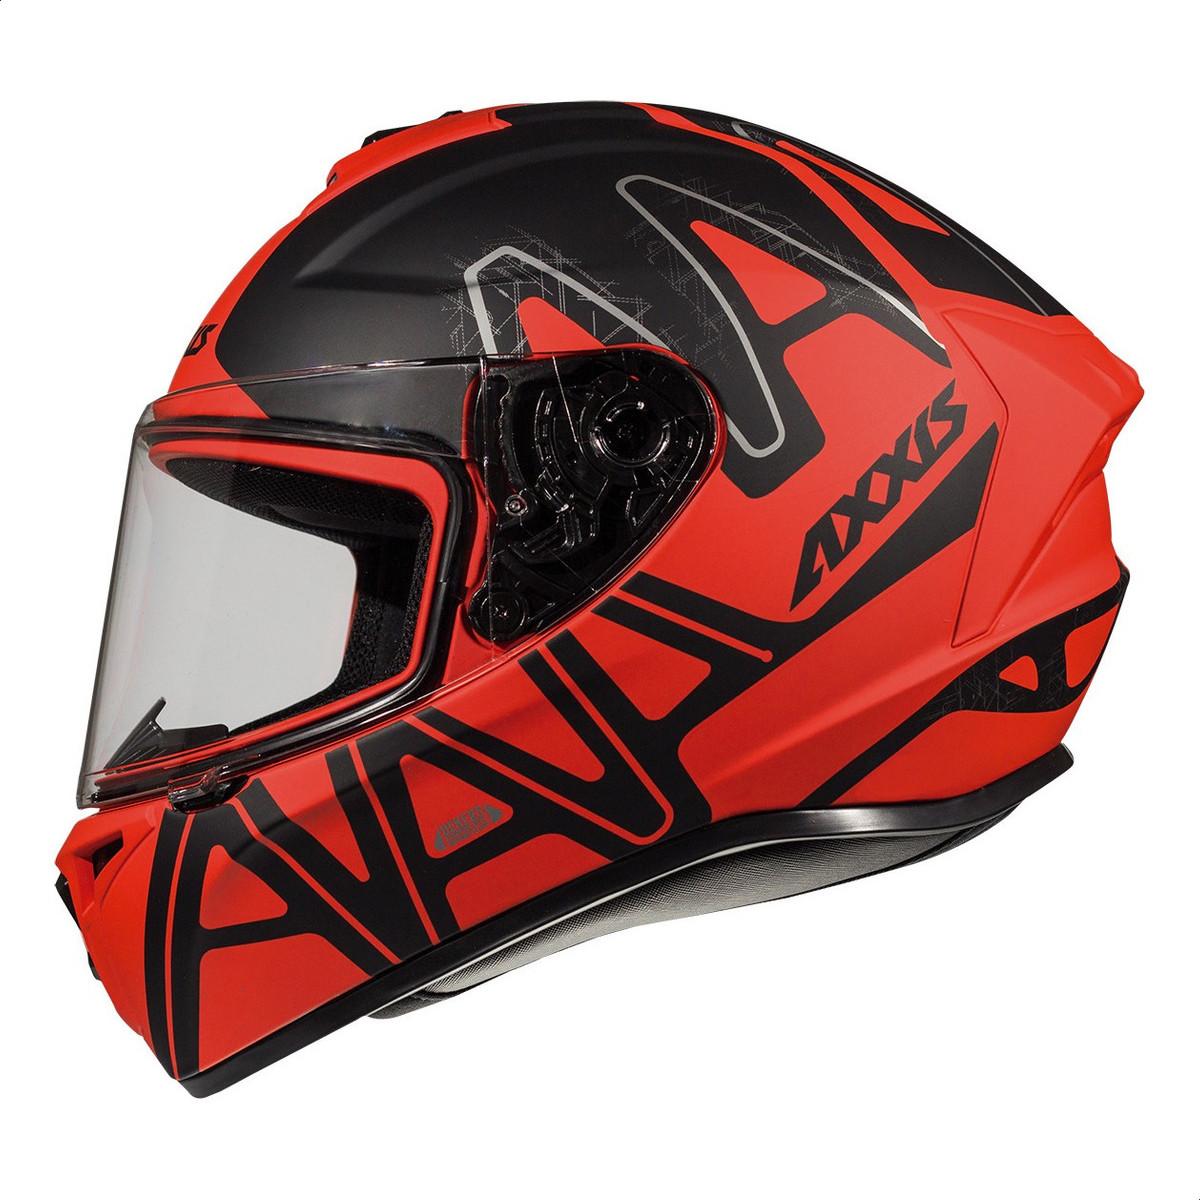 Casco Integral Axxis Draken Dekers C2 Rojo Mate